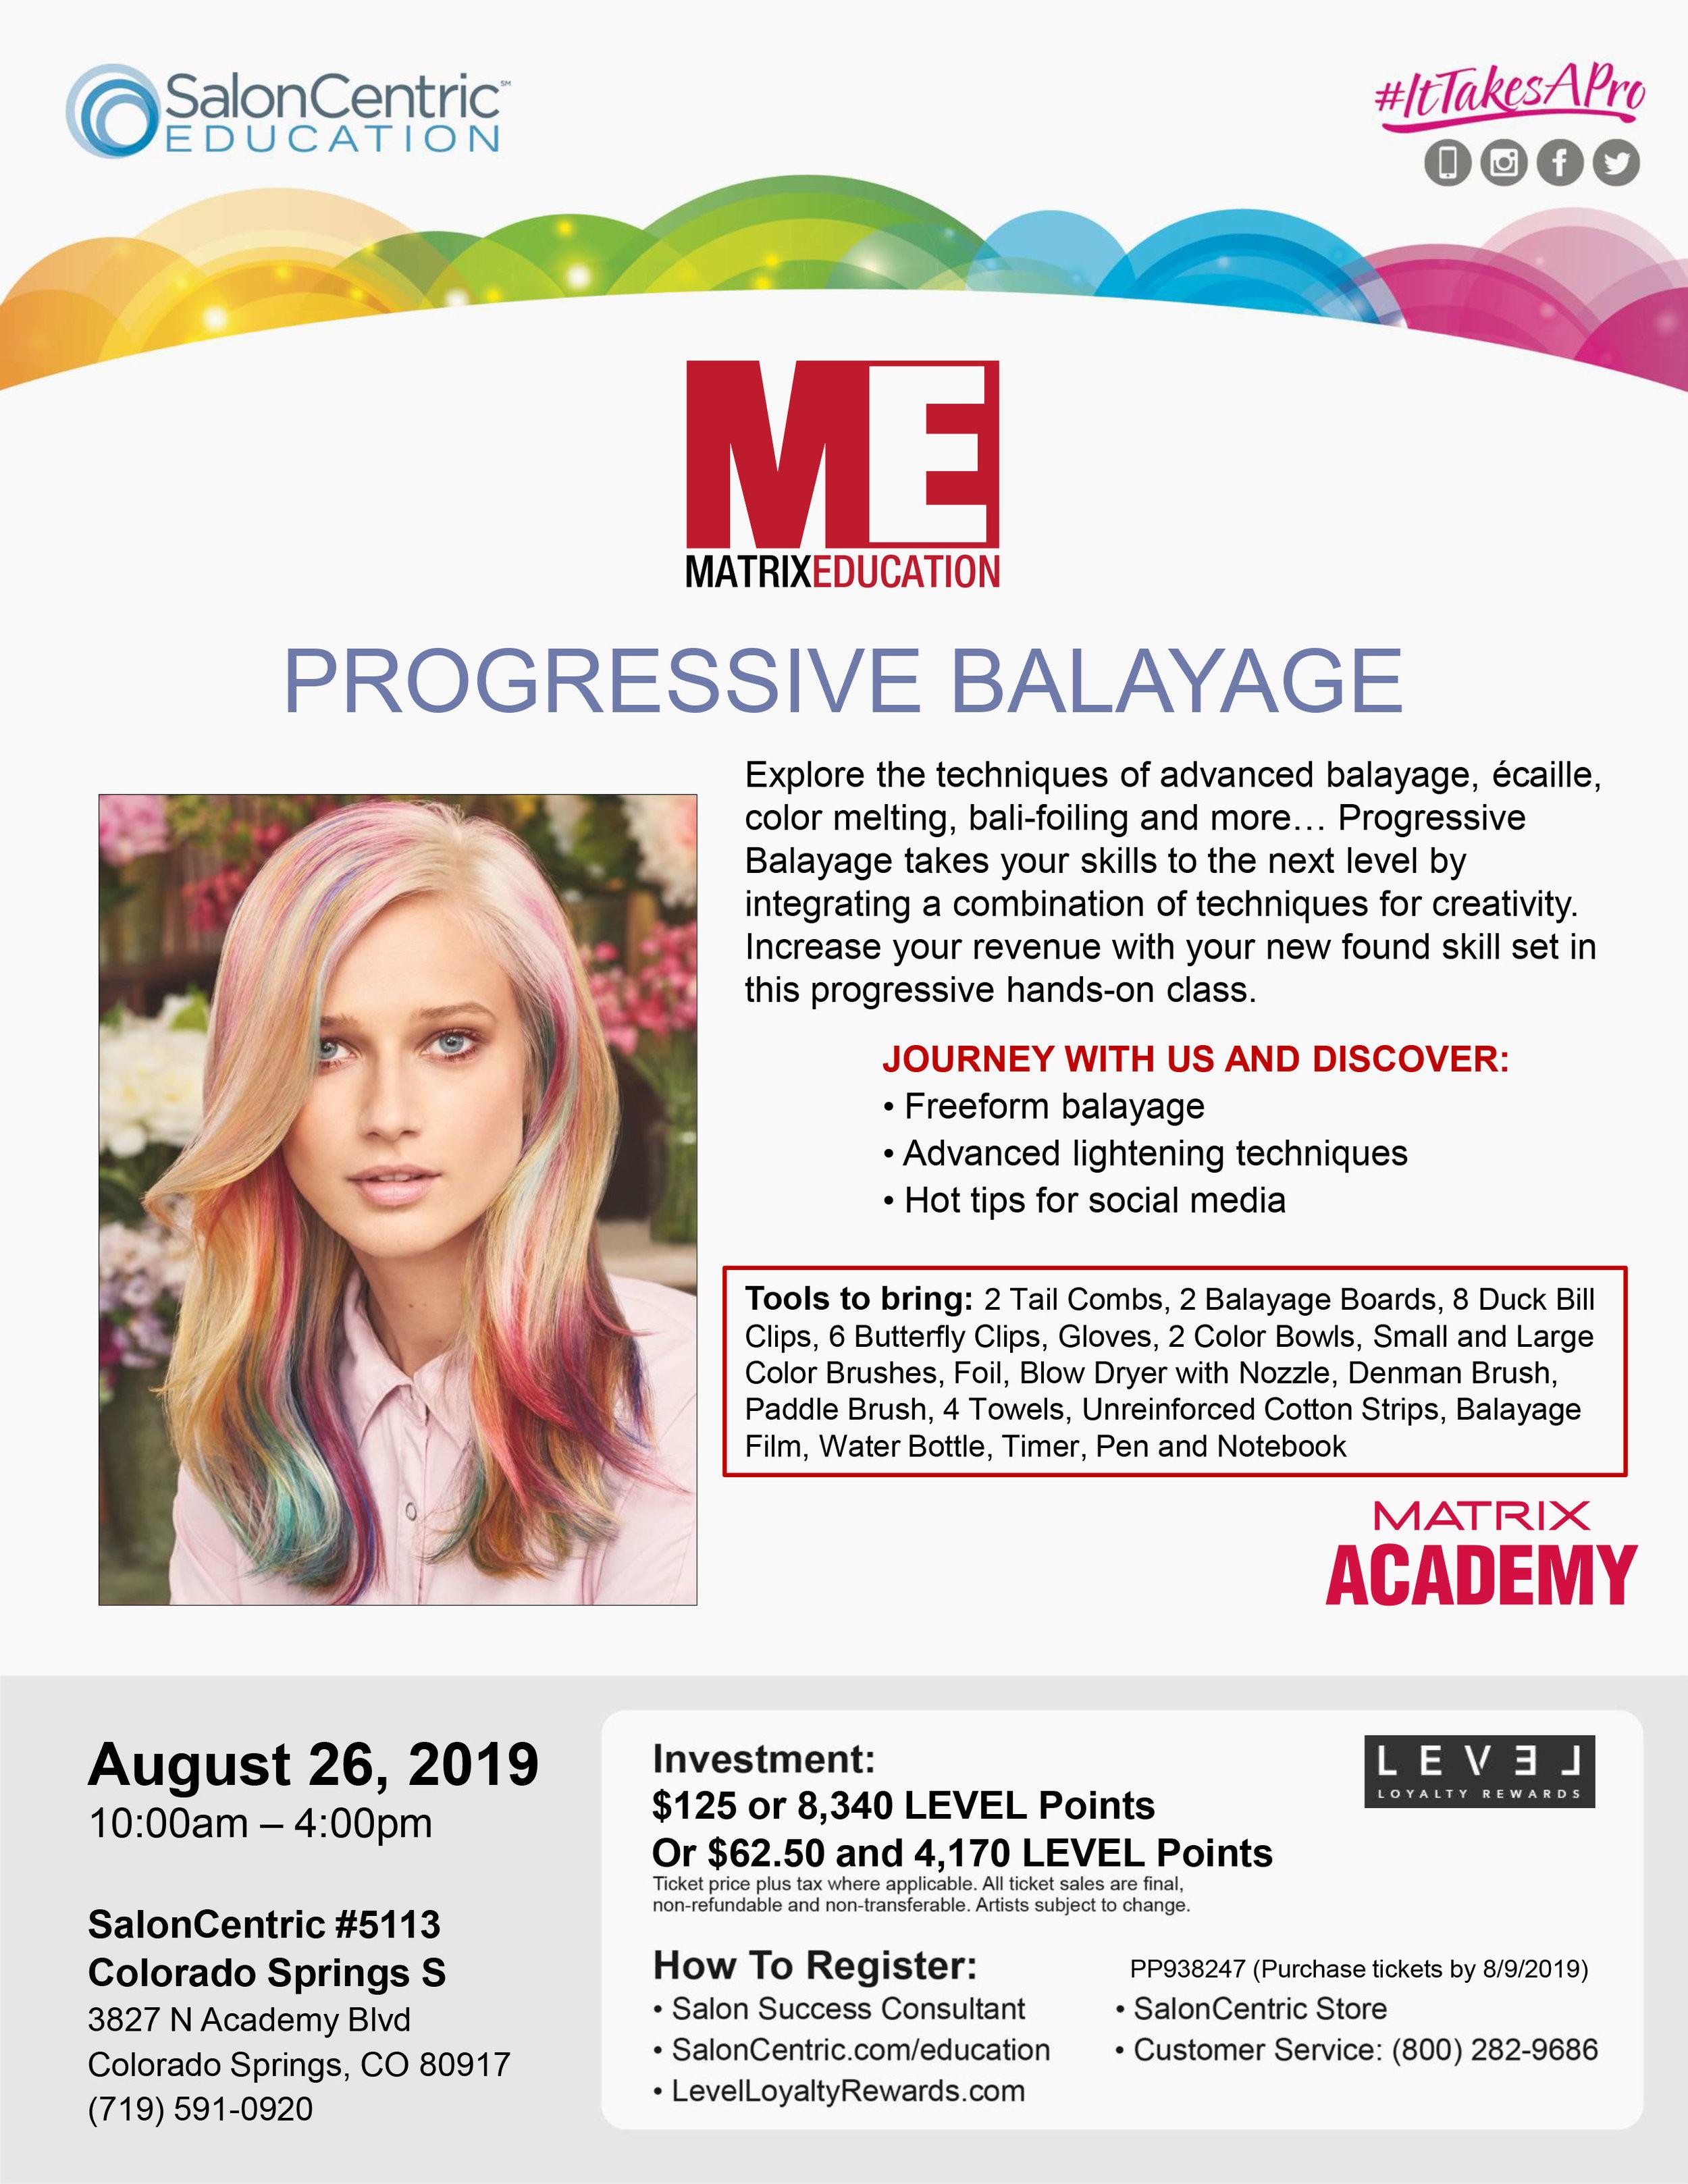 Matrix-CRAFT-Academy---Progressive-Balayage-Hands-On---August-26,-2019---Colorado-Springs-S,-CO.jpg